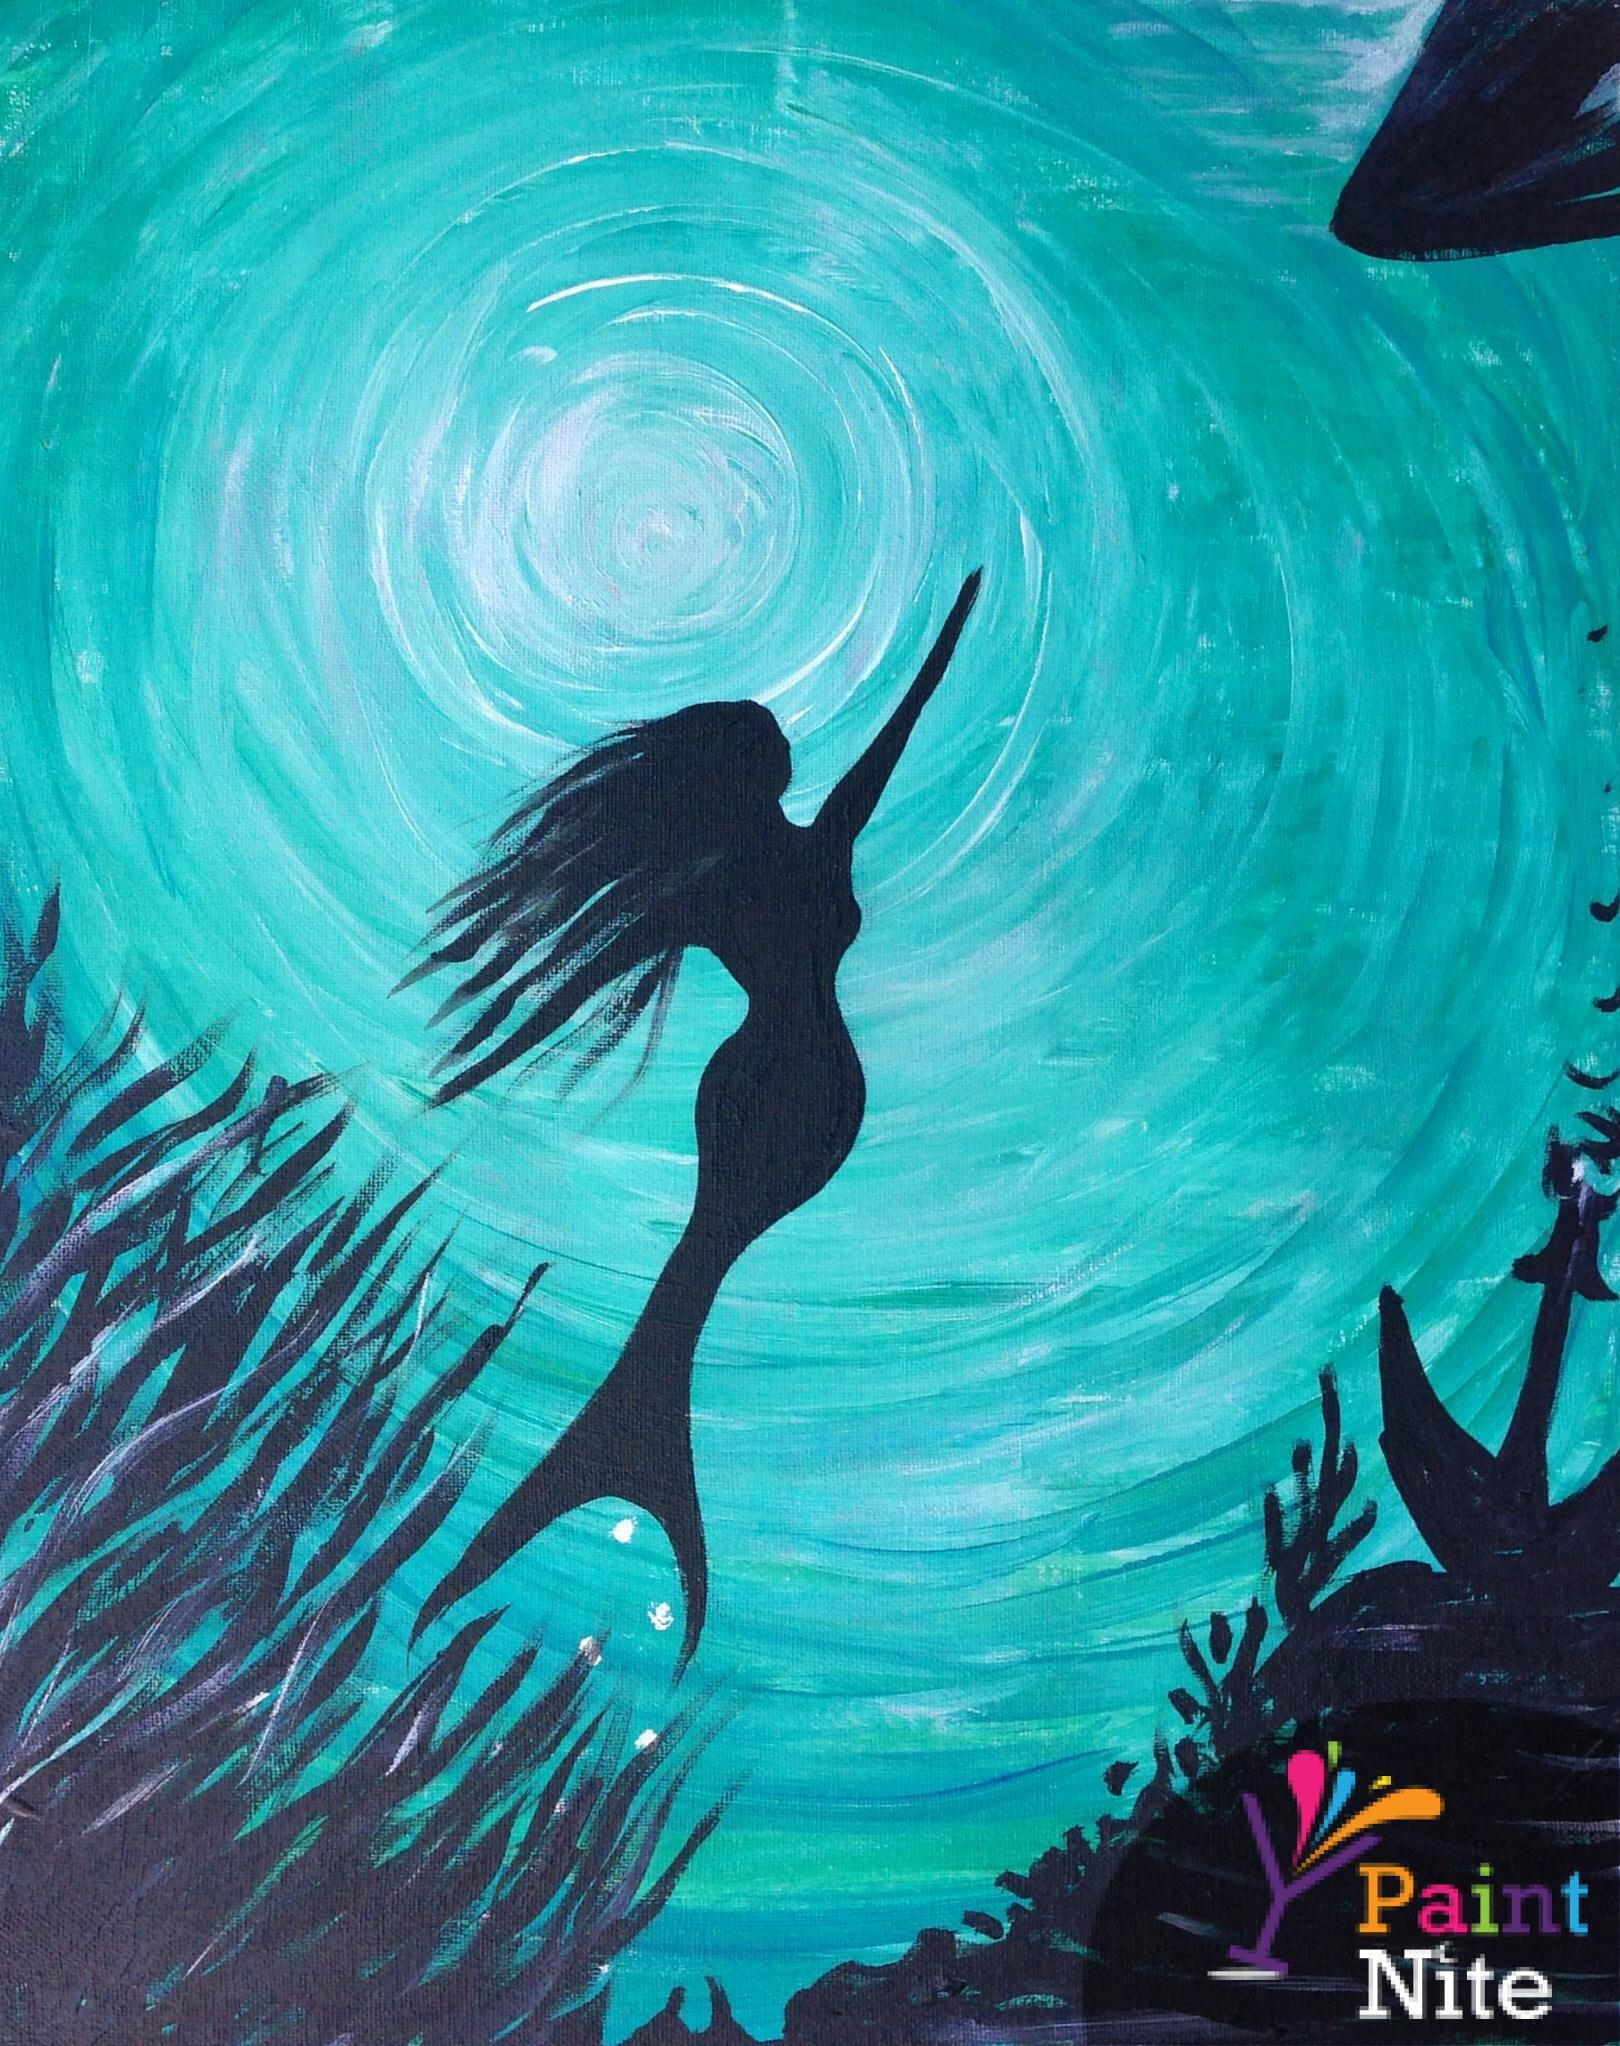 Mermaids Dream 1 at Majorca - Paint Nite Events